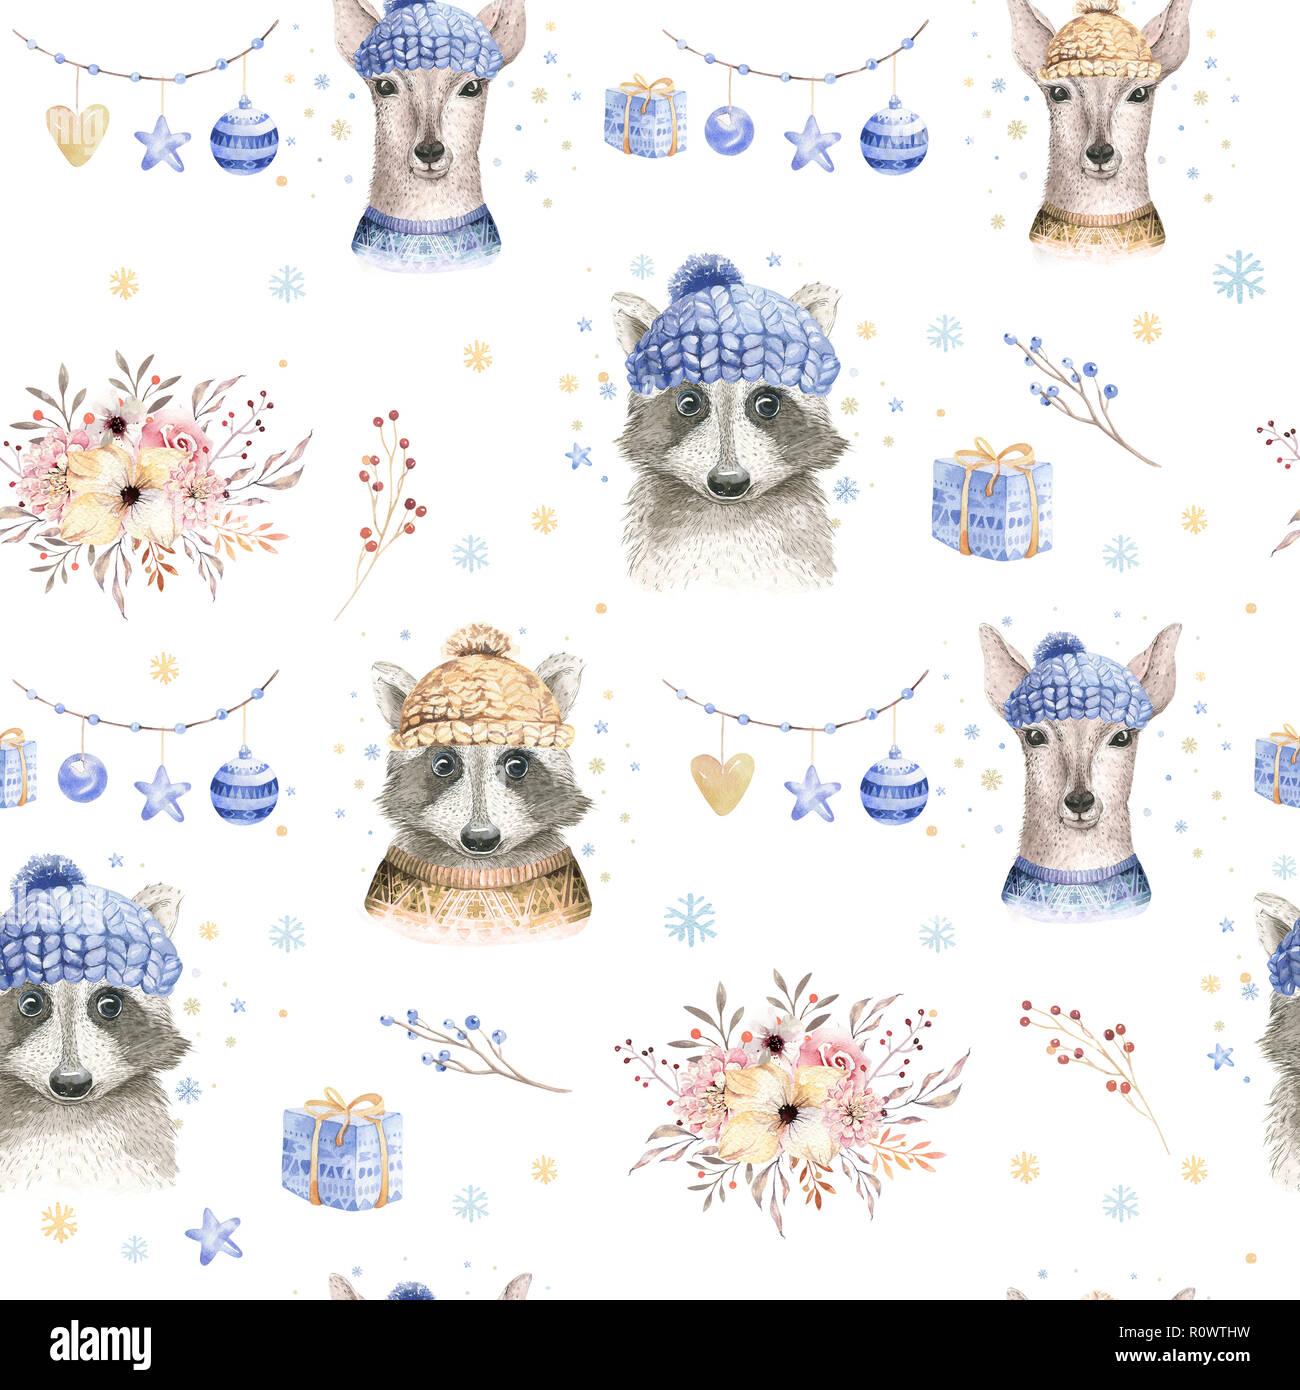 Cartoon Christmas Design Illustration Children Stock Photos Amp Cartoon Christmas Design